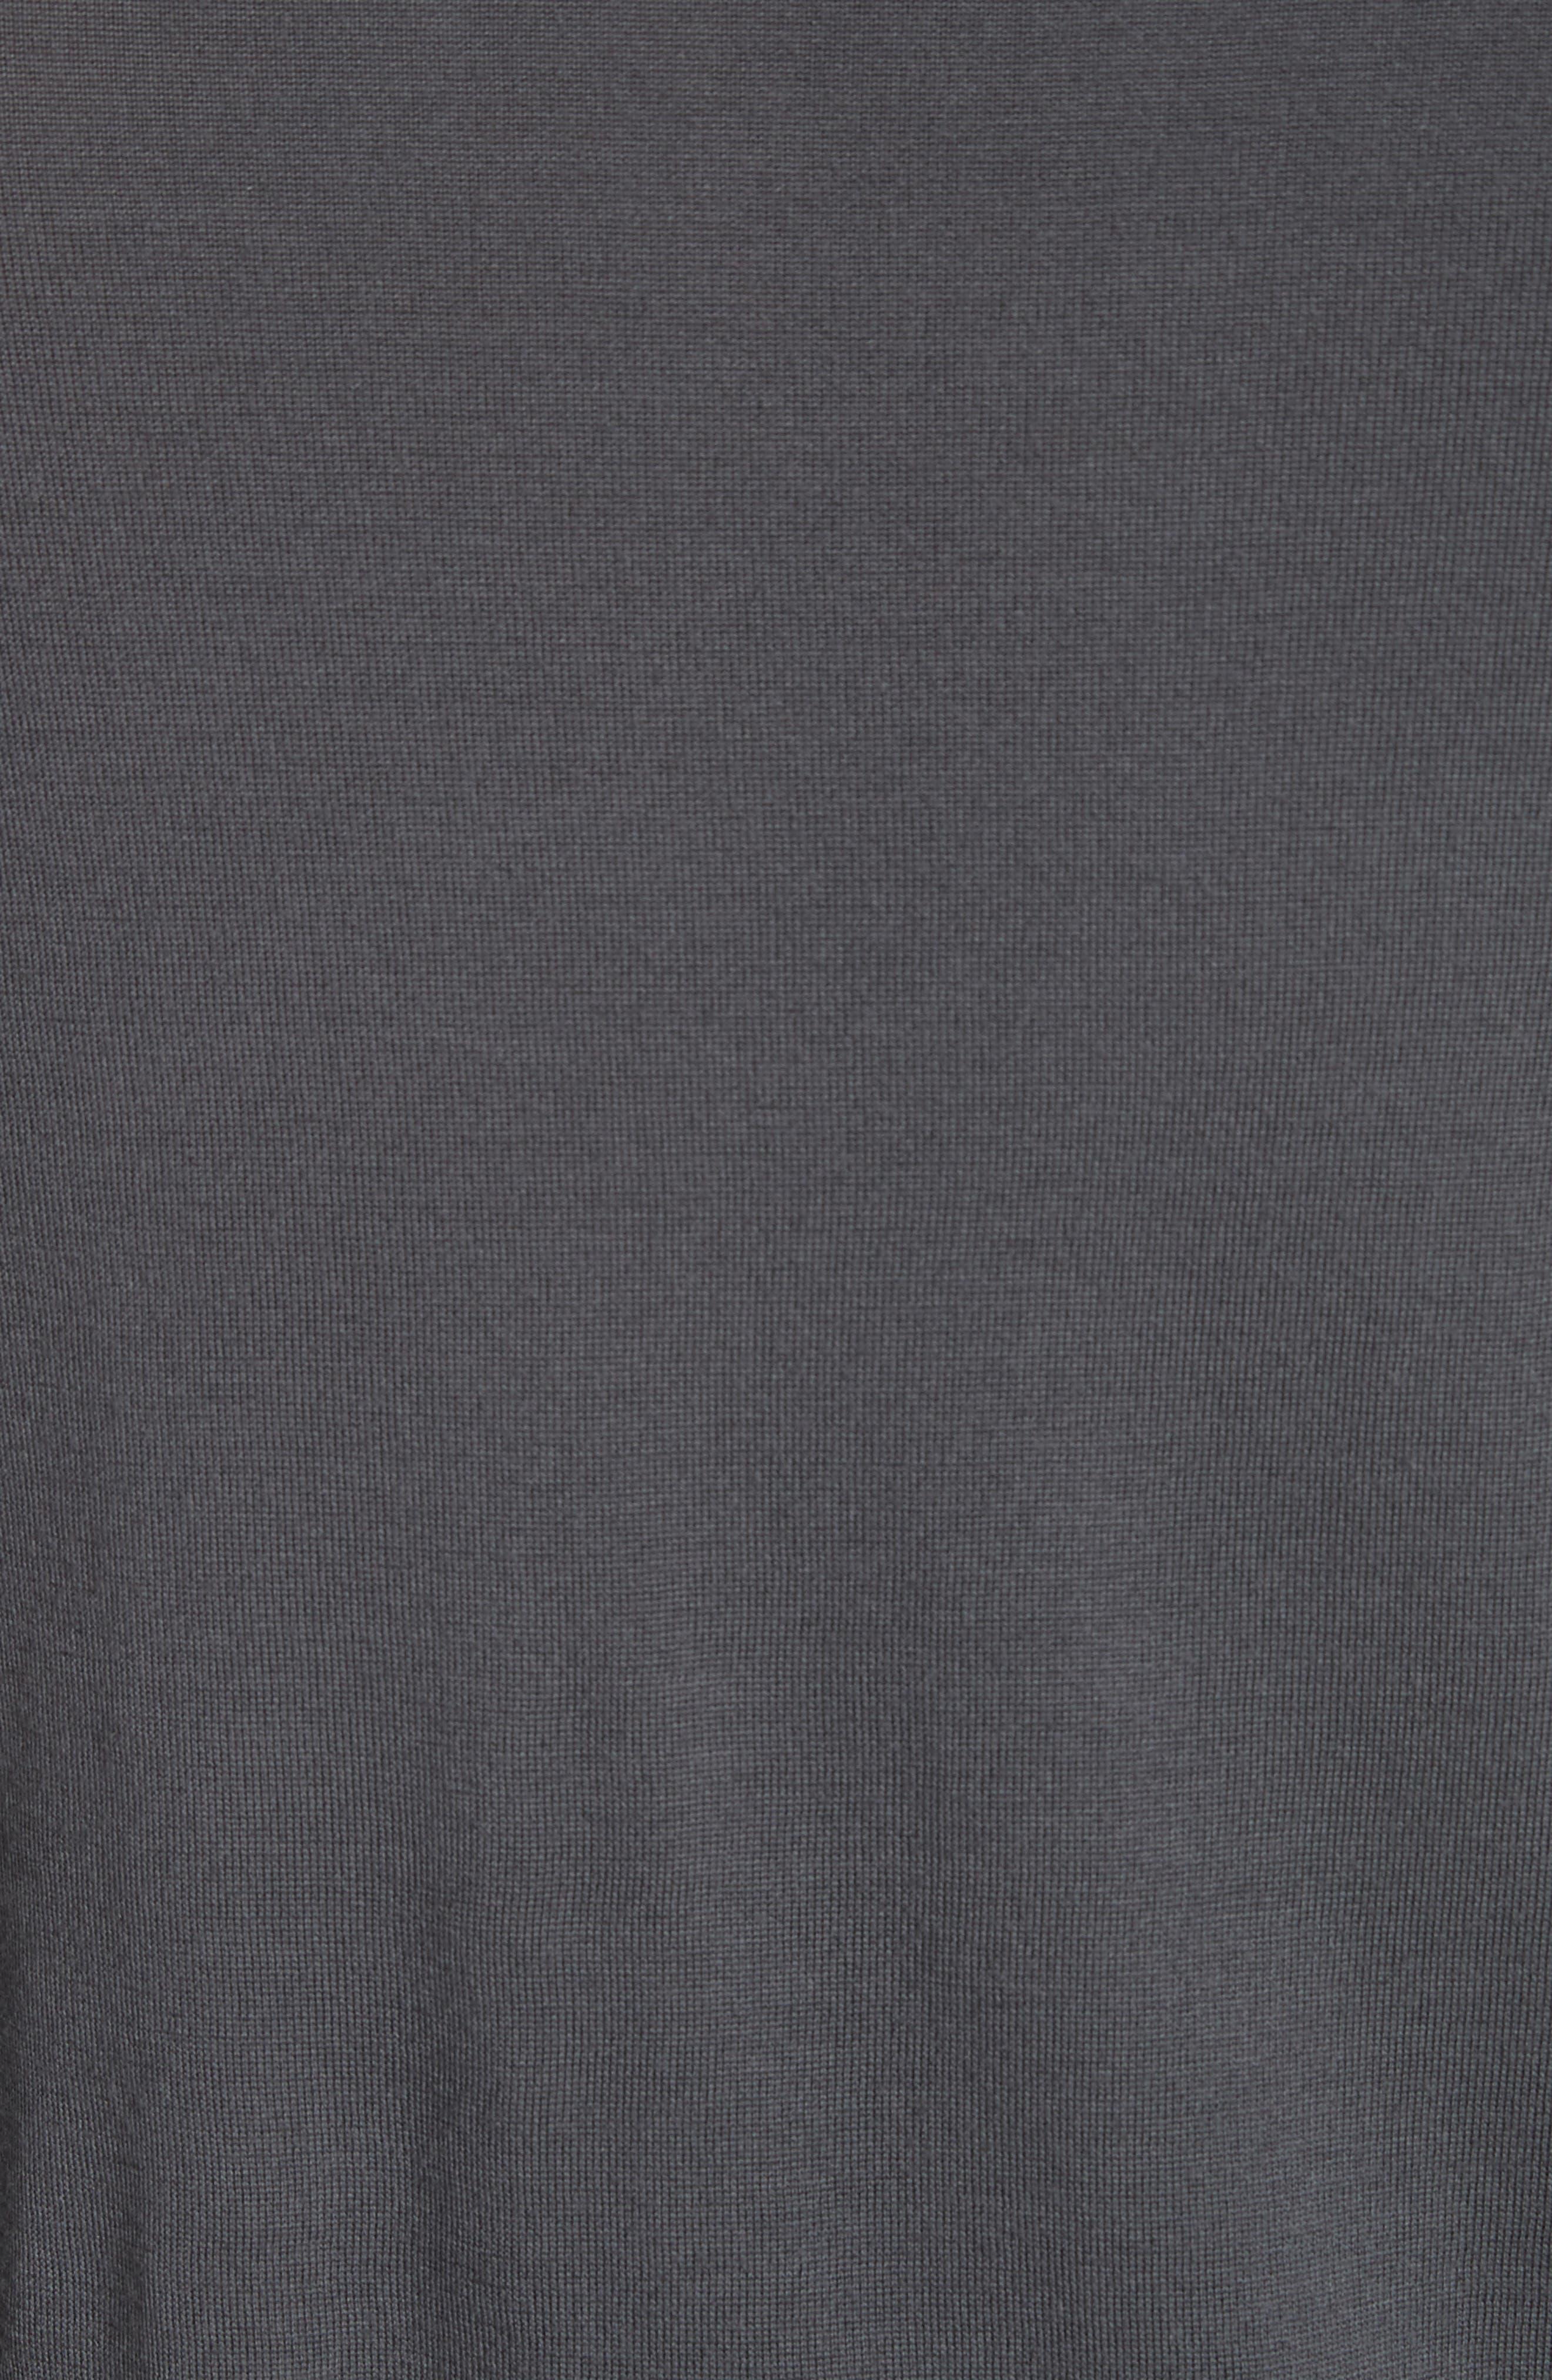 Alternate Image 5  - Emporio Armani Slim Fit Wool Sweater